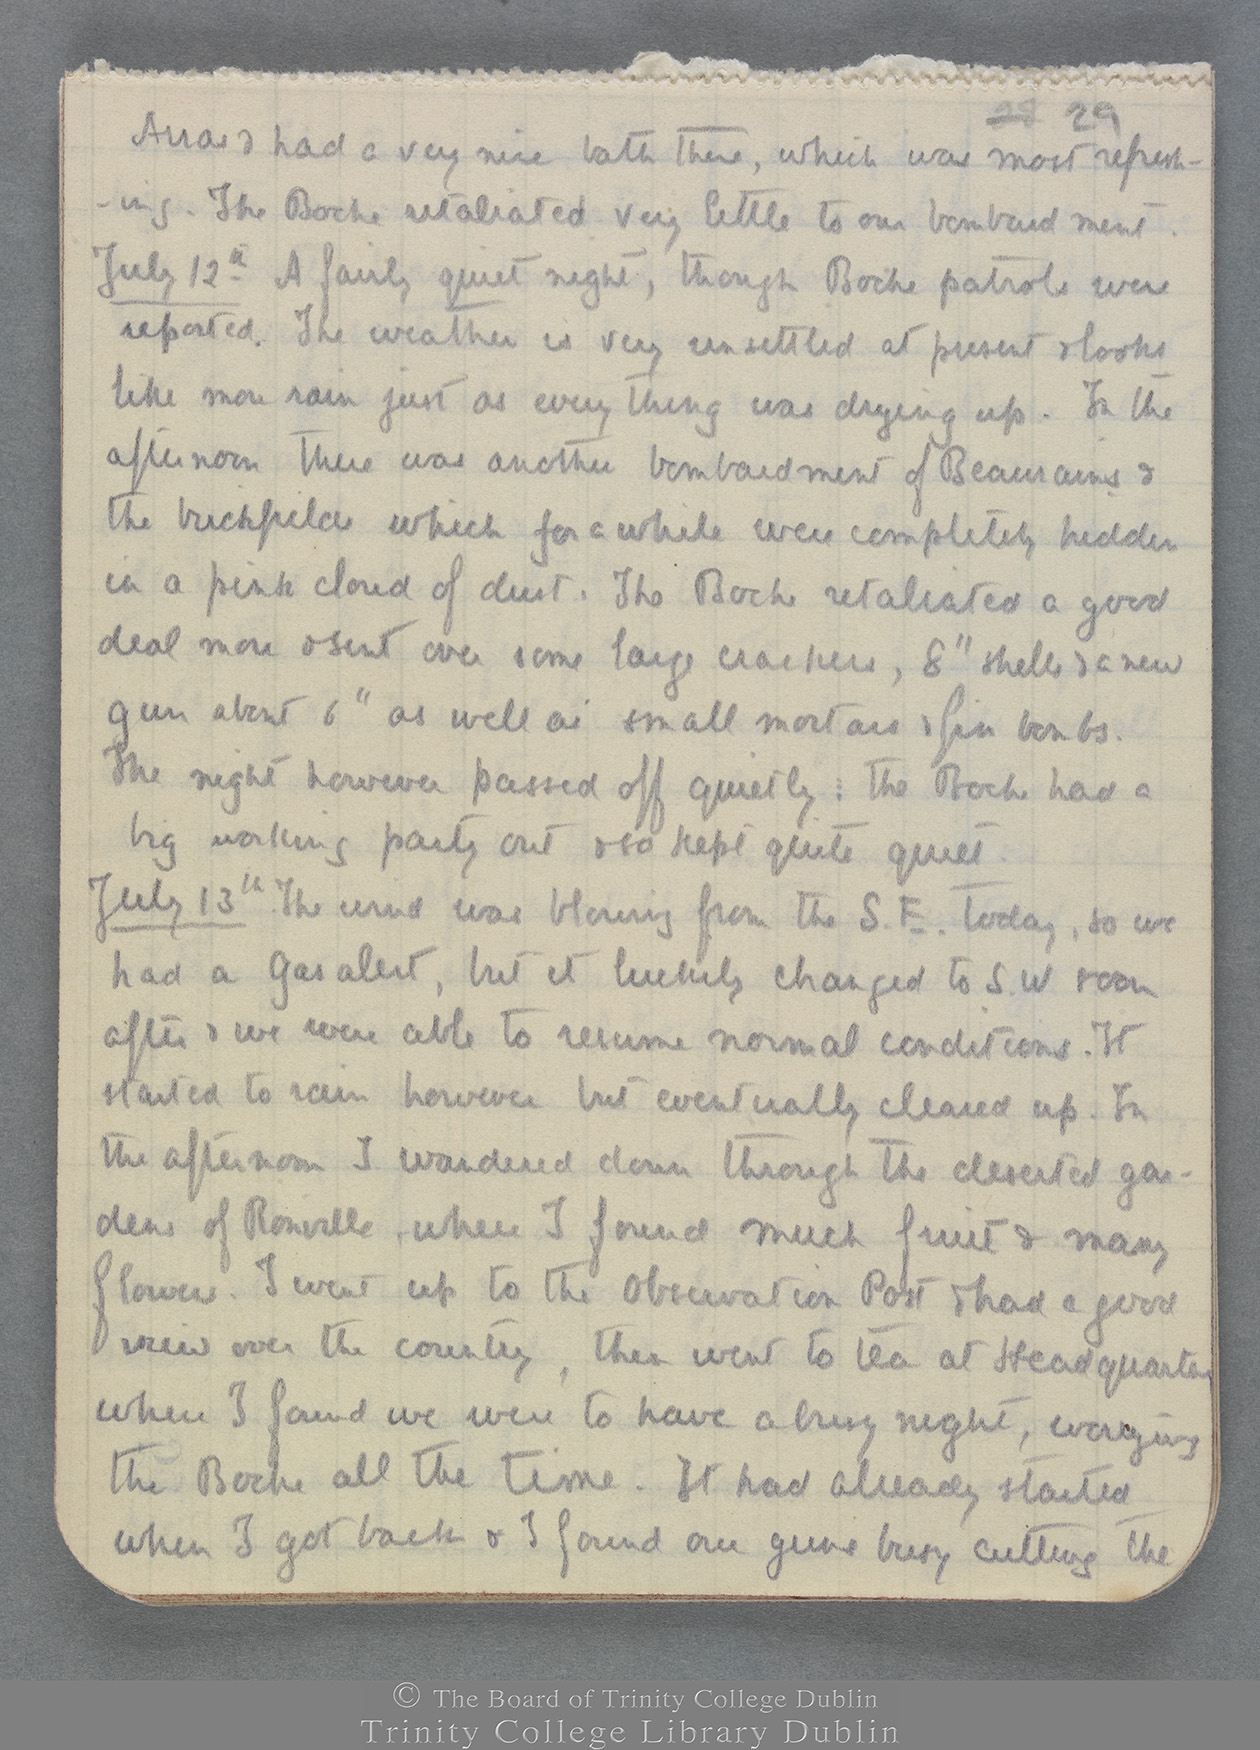 TCD MS 10821 folio 29 recto